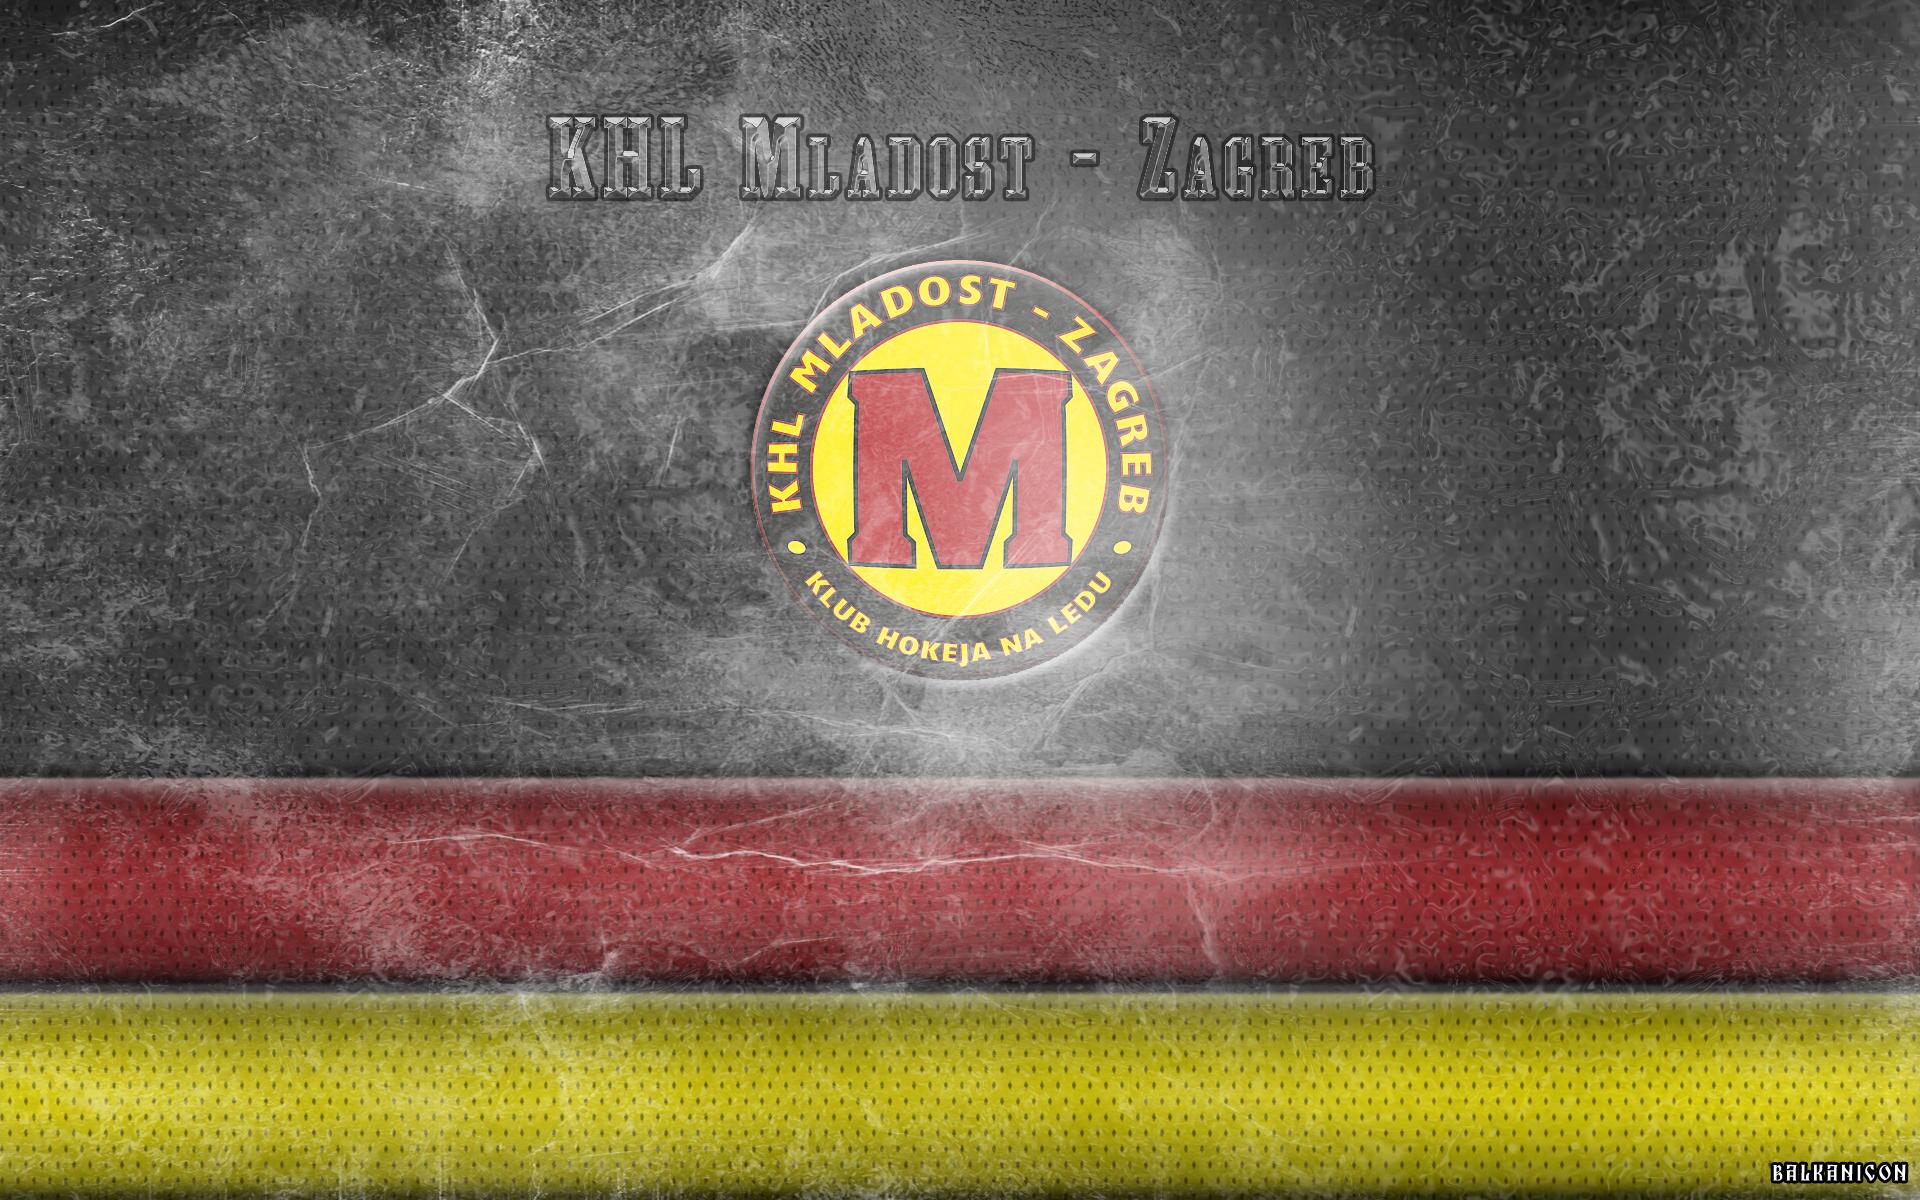 KHL Mladost wallpaper by Balkanicon 1920x1200